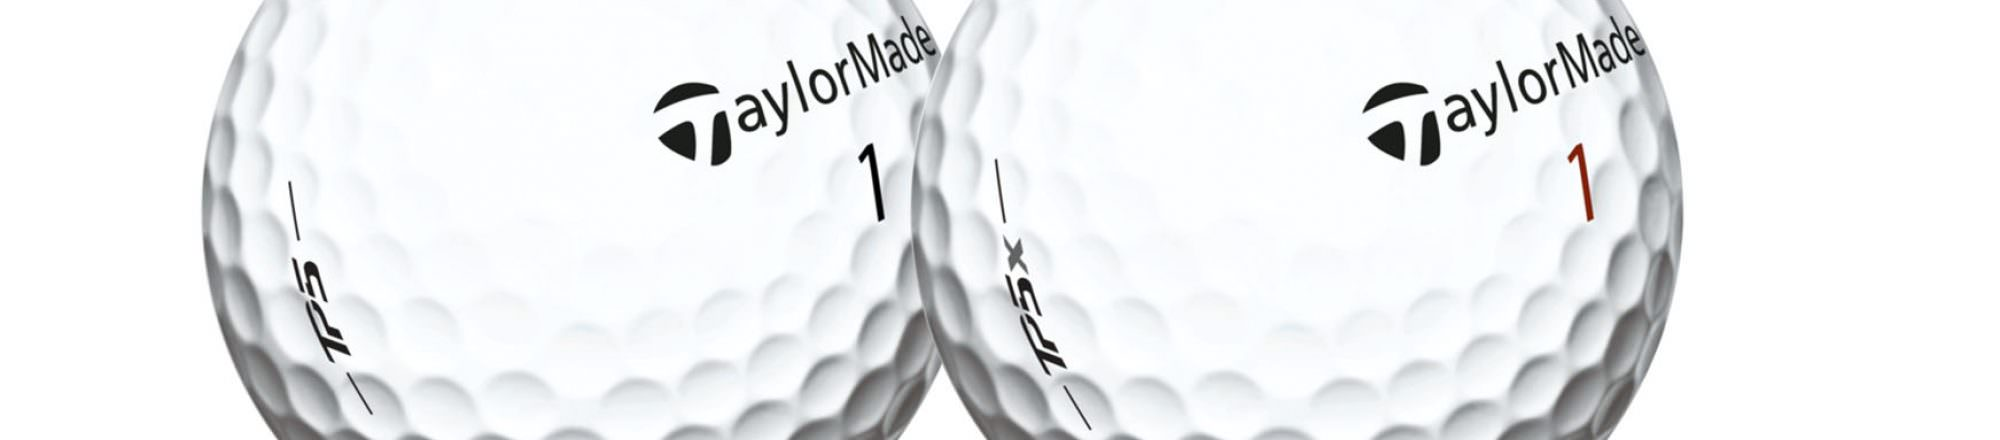 TaylorMade unveil new TP5 & TP5x golf balls